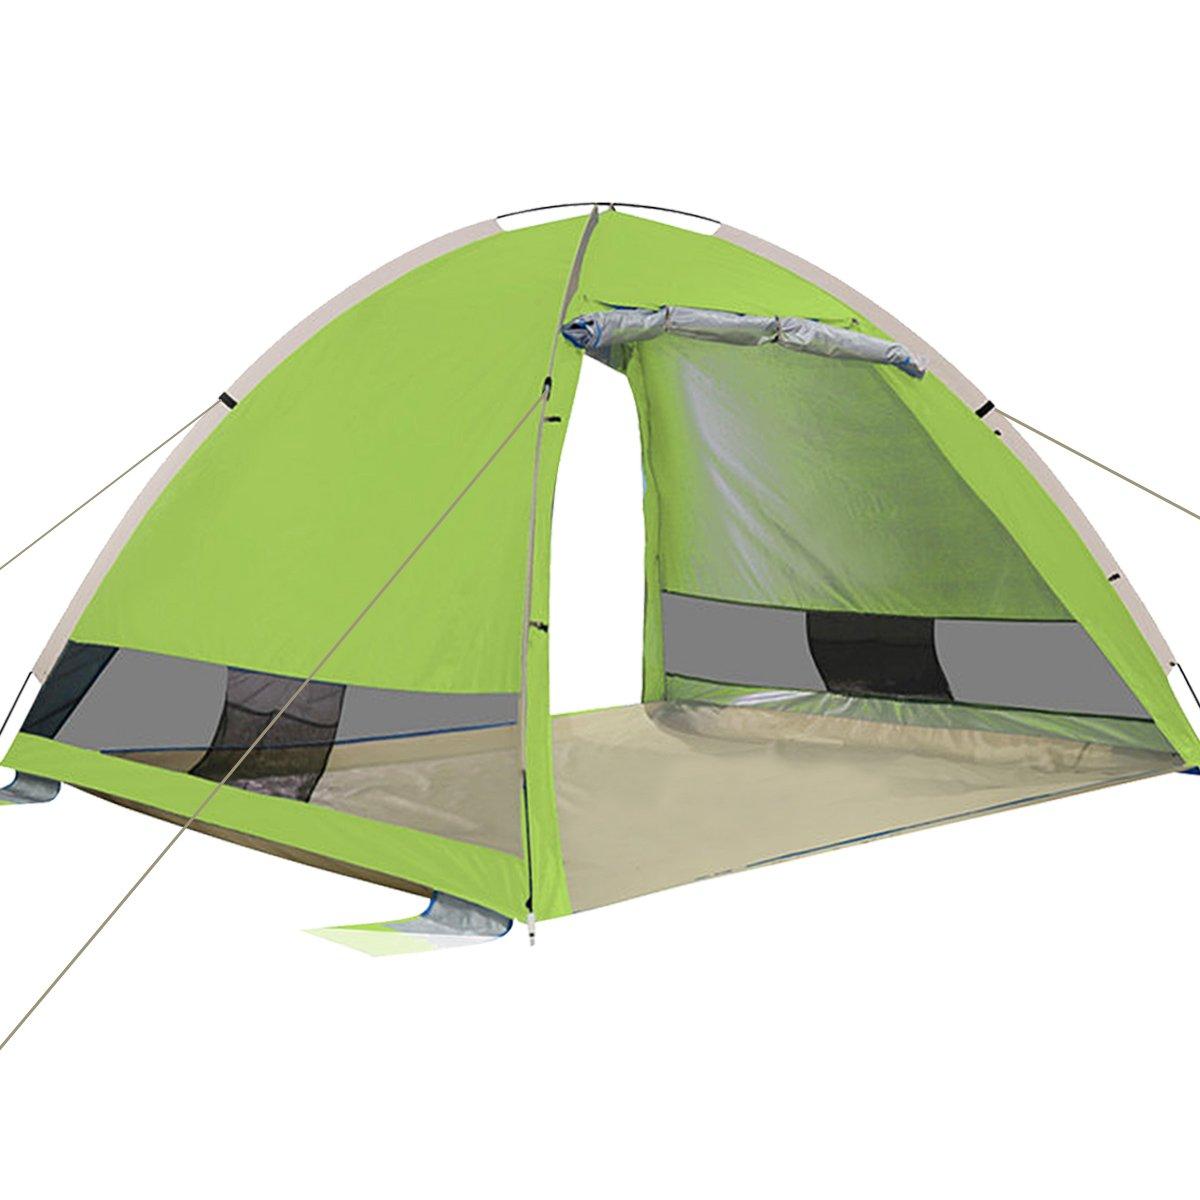 G4Free Large Pop Up Beach Tent